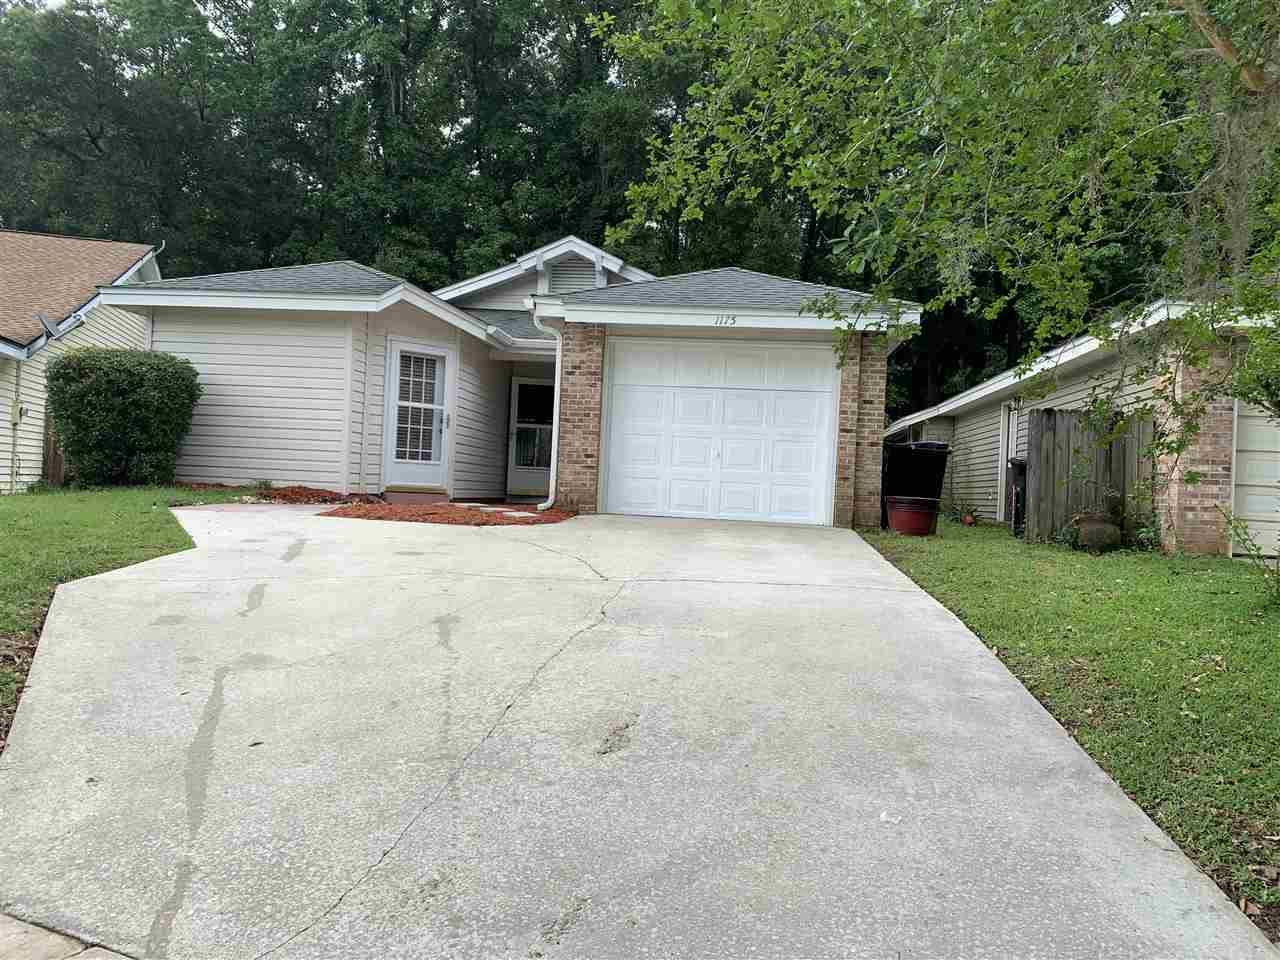 1175 Tumbleweed Run, Tallahassee, FL 32311 - MLS#: 332245